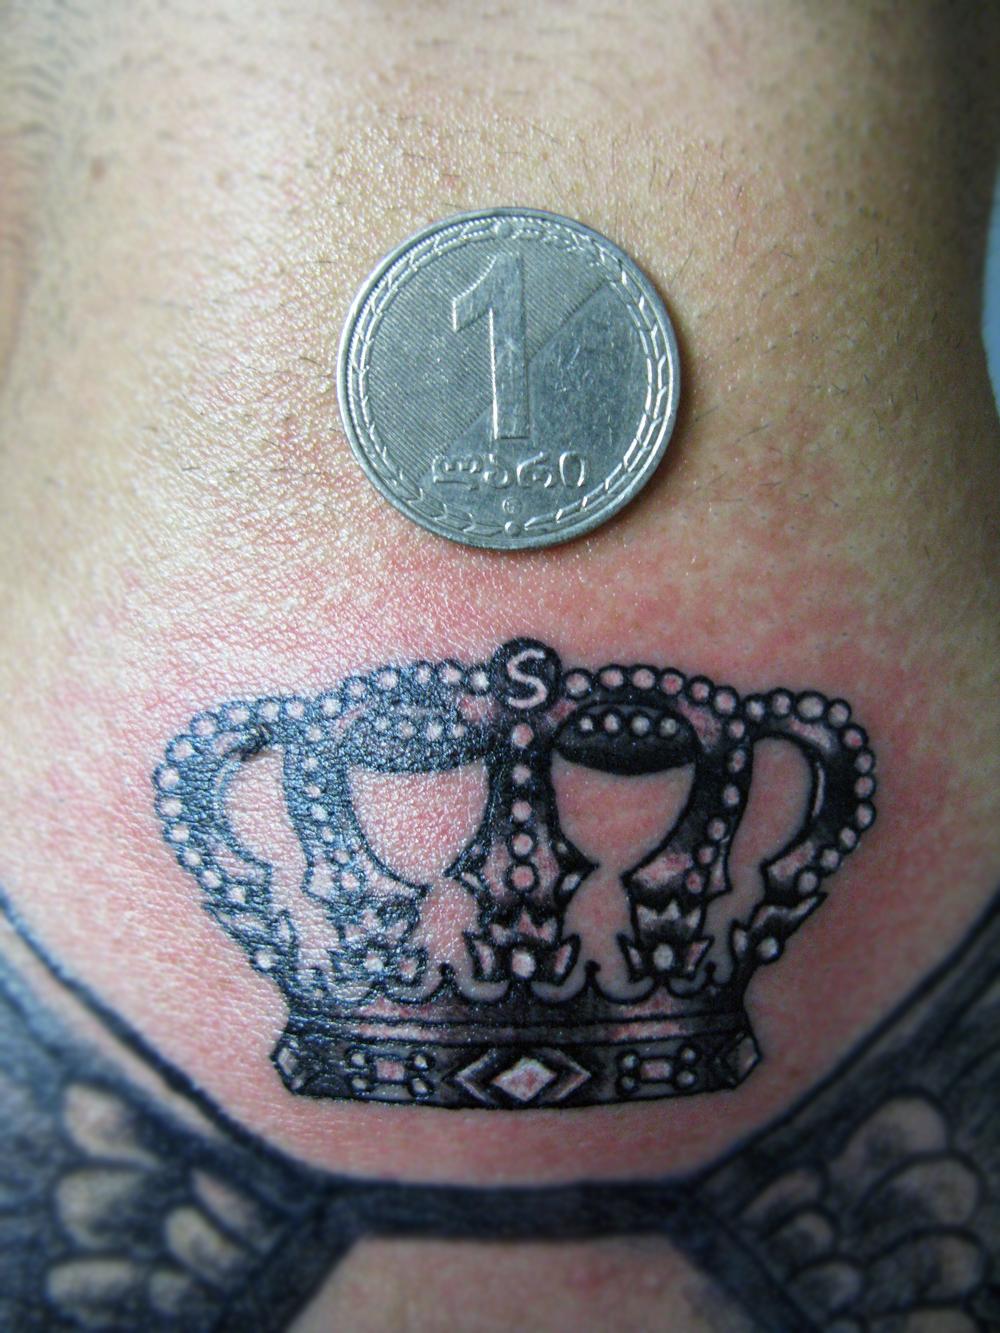 Crown tattoo on tumblr - Queen Crown Tattoos Tumblr